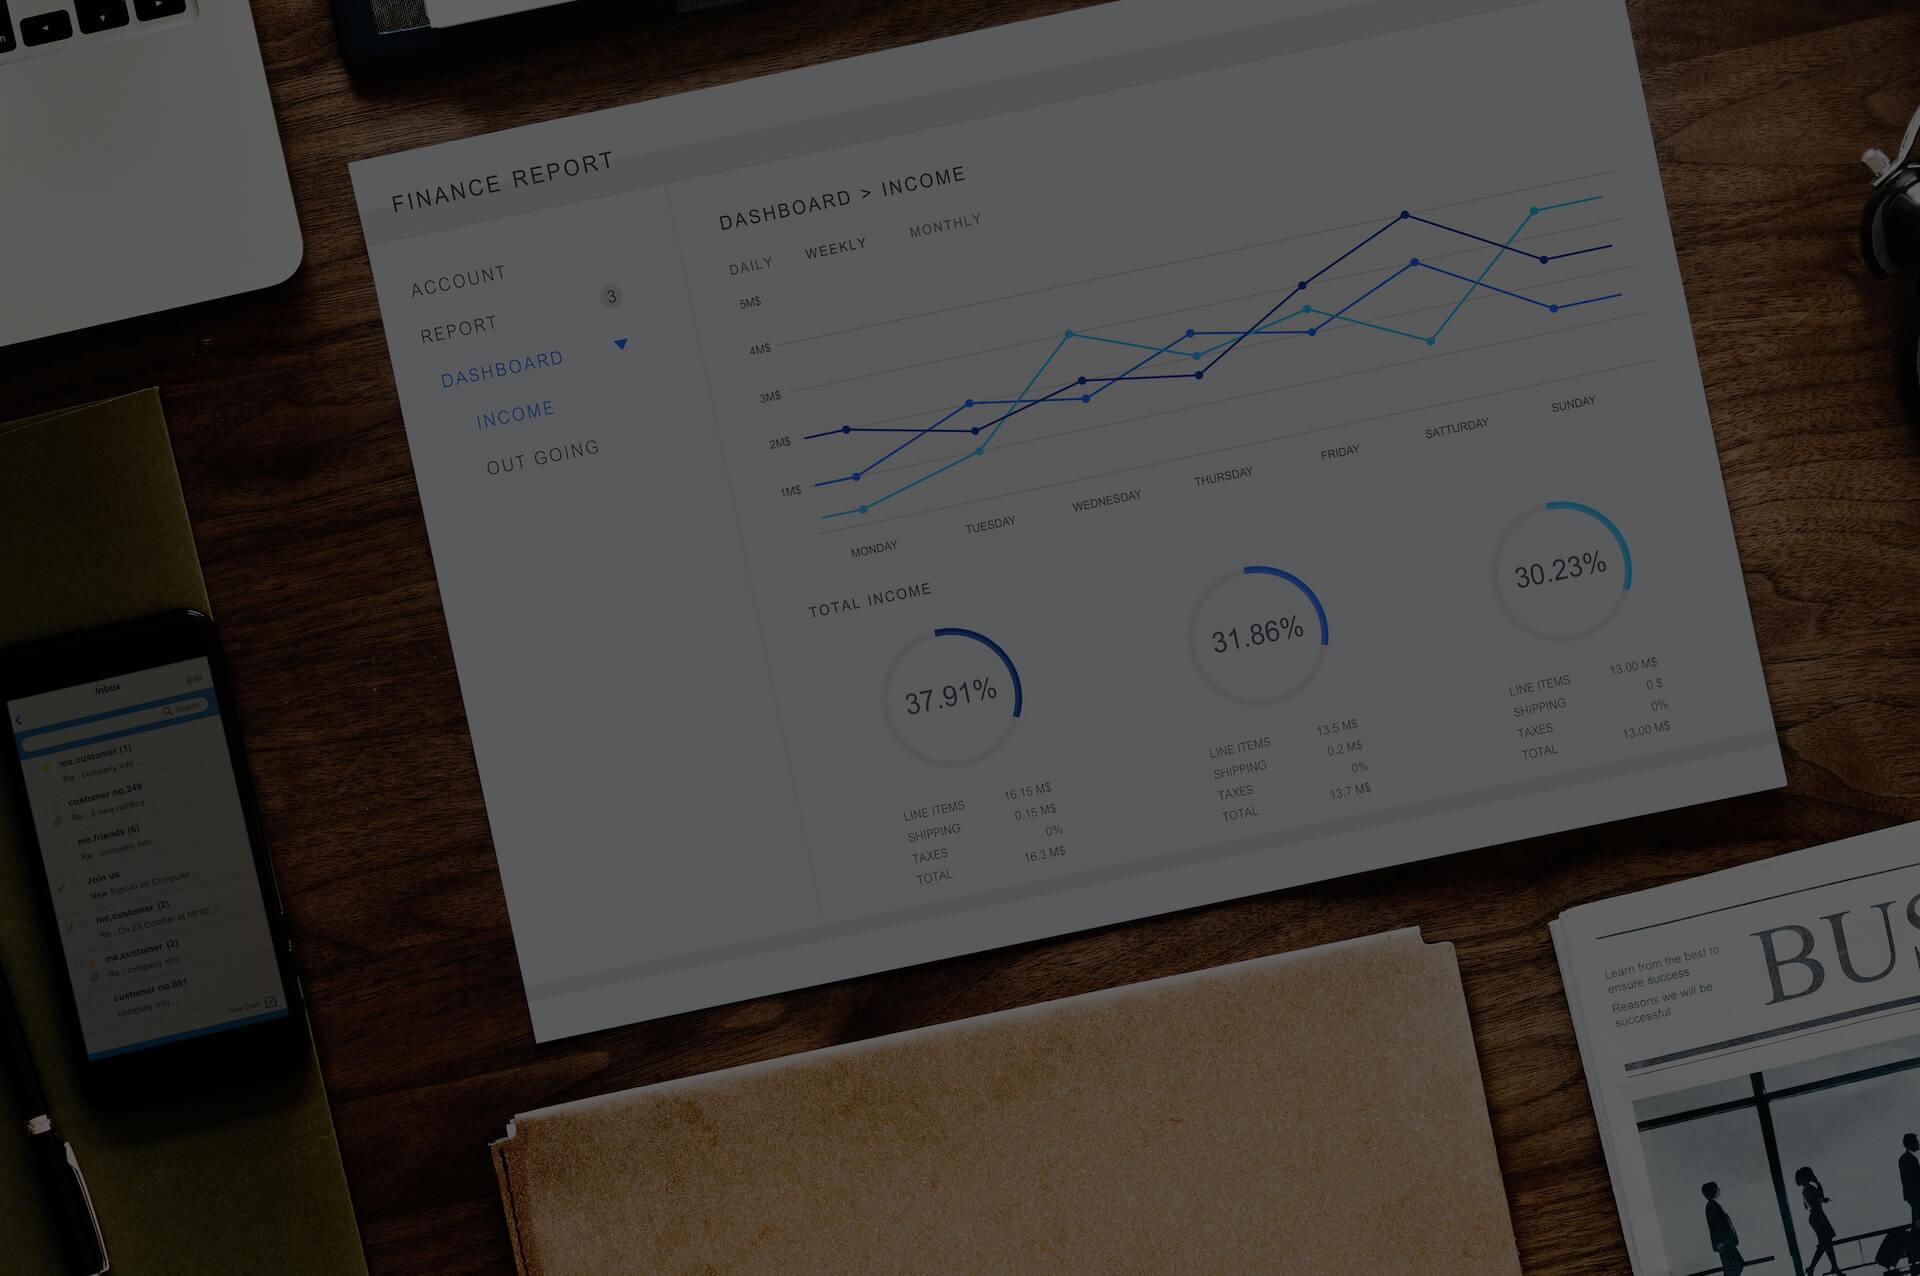 Hvordan kommer man i gang med en datastrategi?